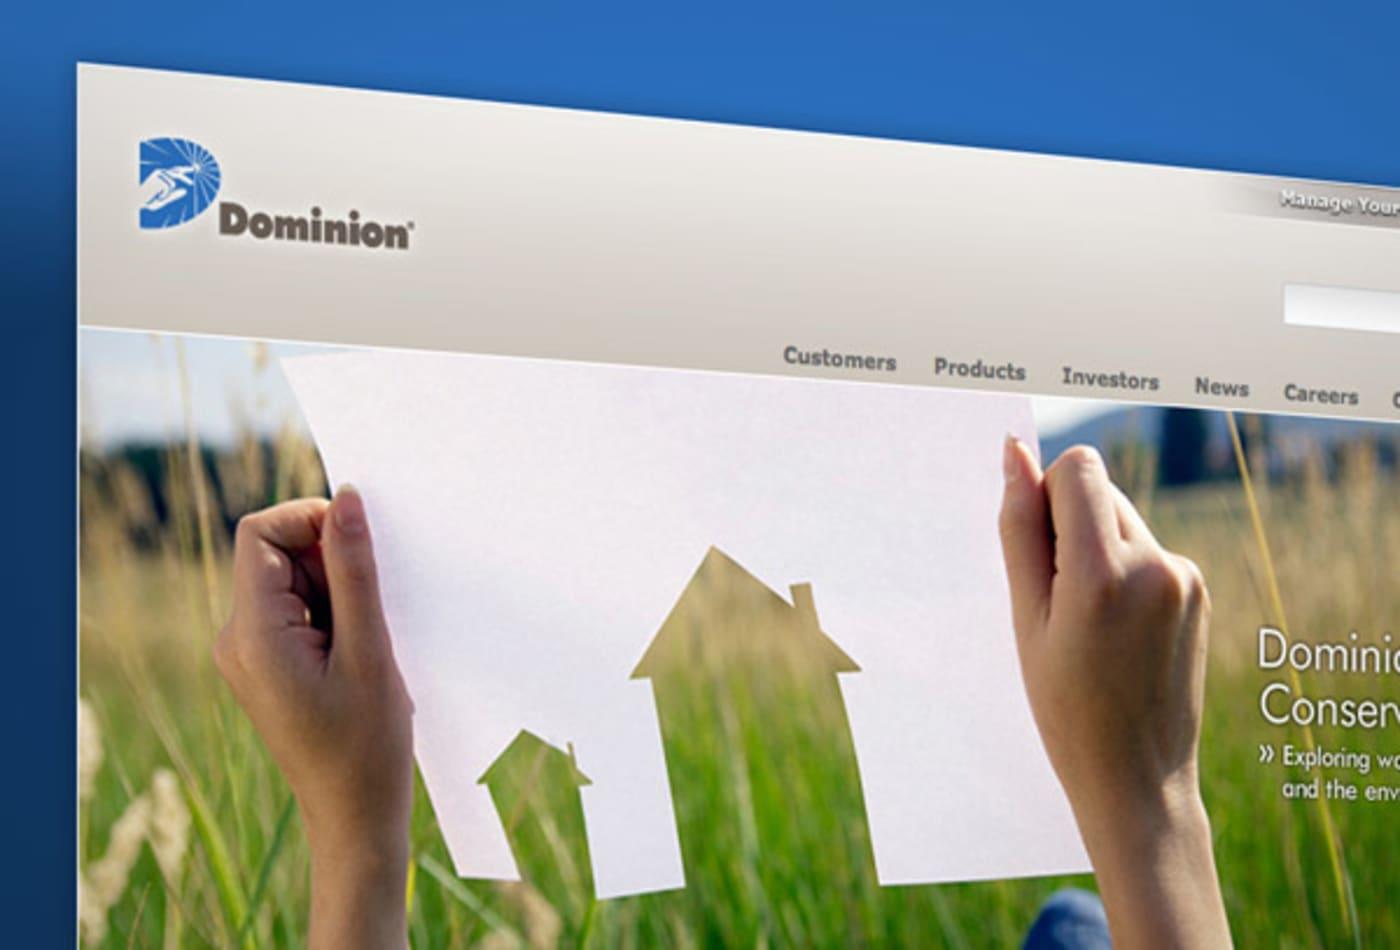 fm-slow-money-dominion.jpg